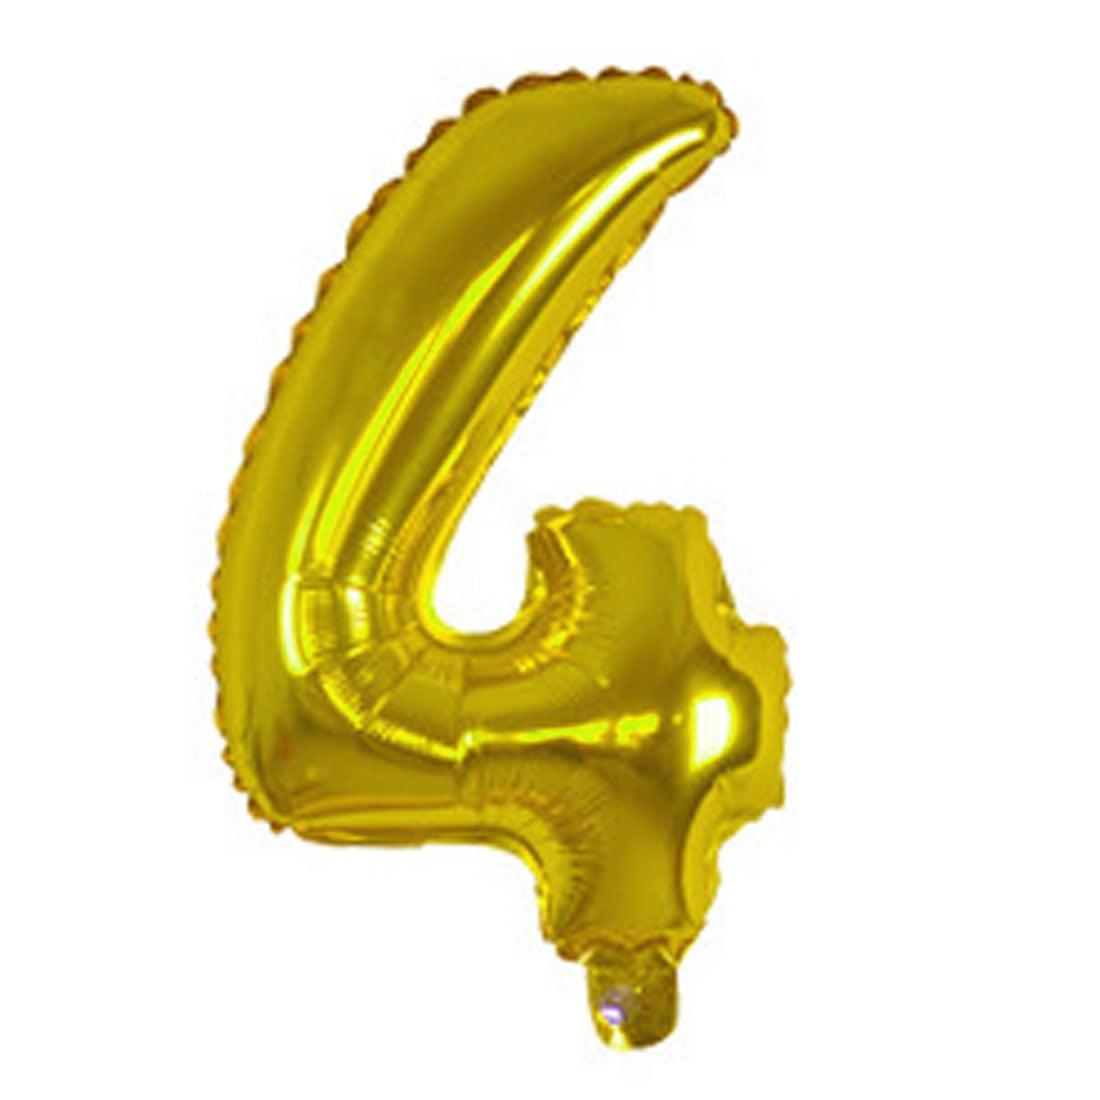 "Unique Bargains Foil Number 4 Shape Helium Balloon Birthday Wedding Decor Gold Tone 30"""